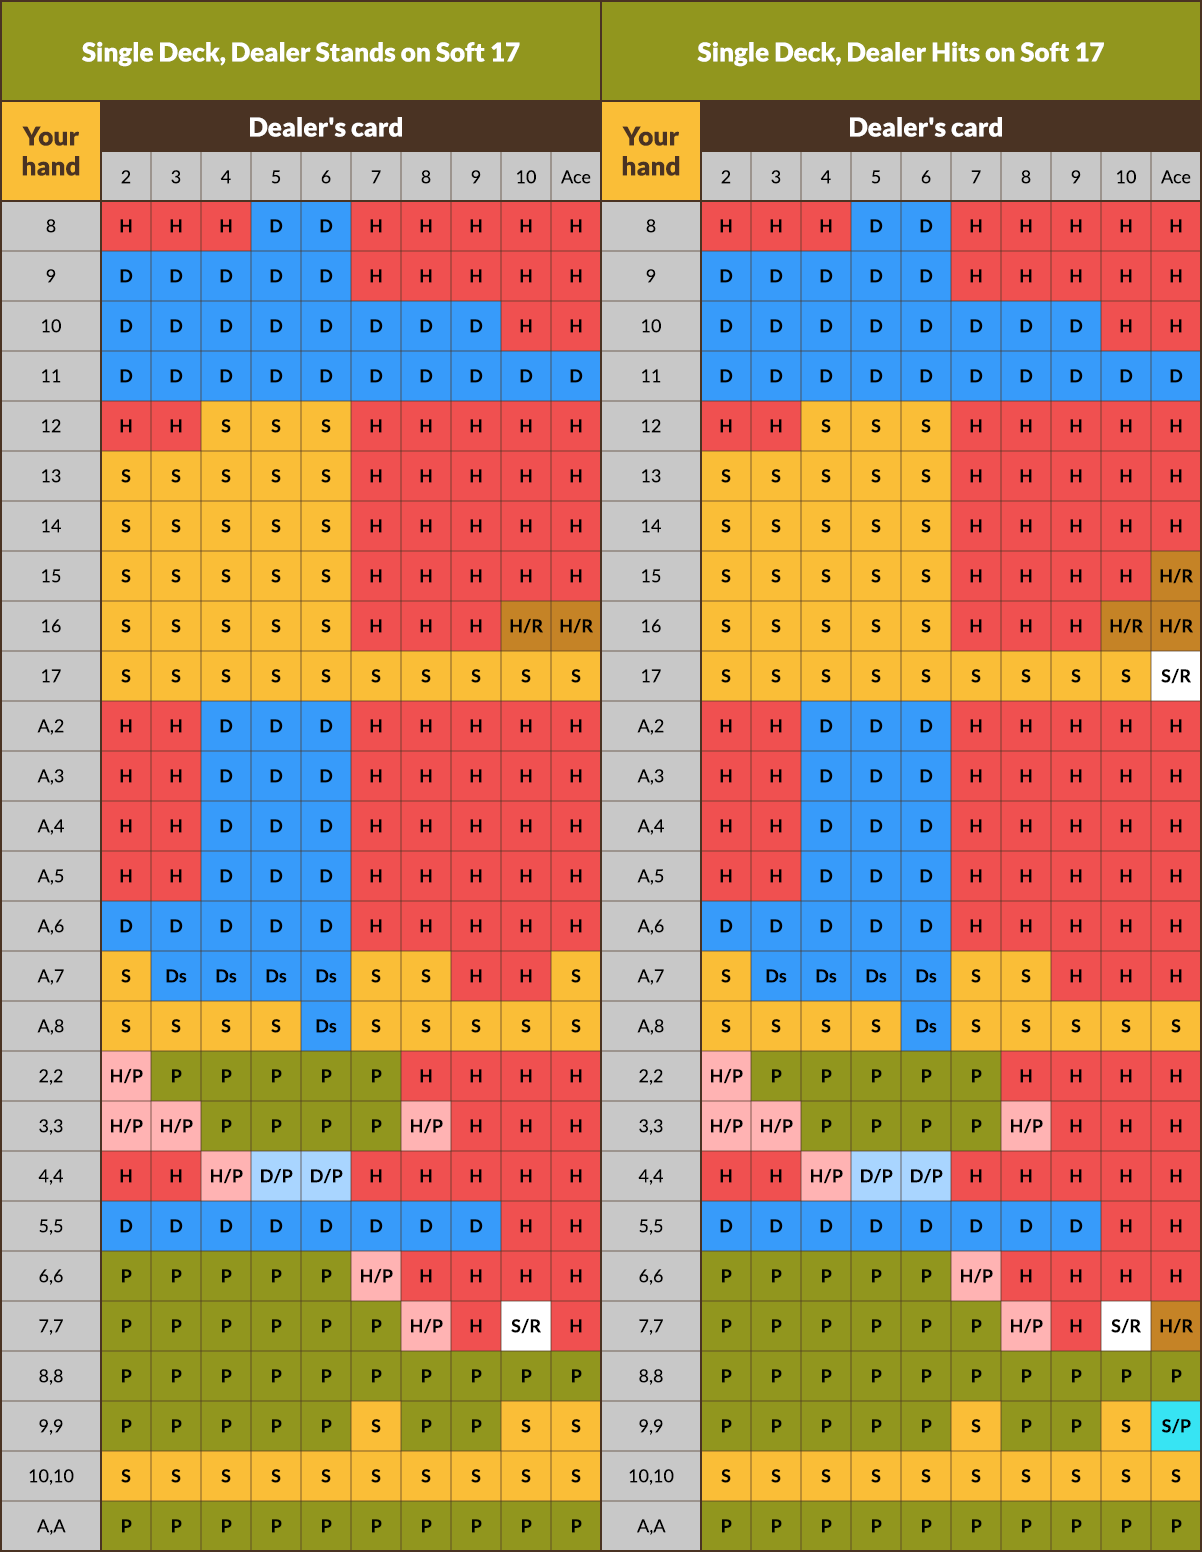 single deck blackjack strategy chart for dealer hitting or standing on soft 17.